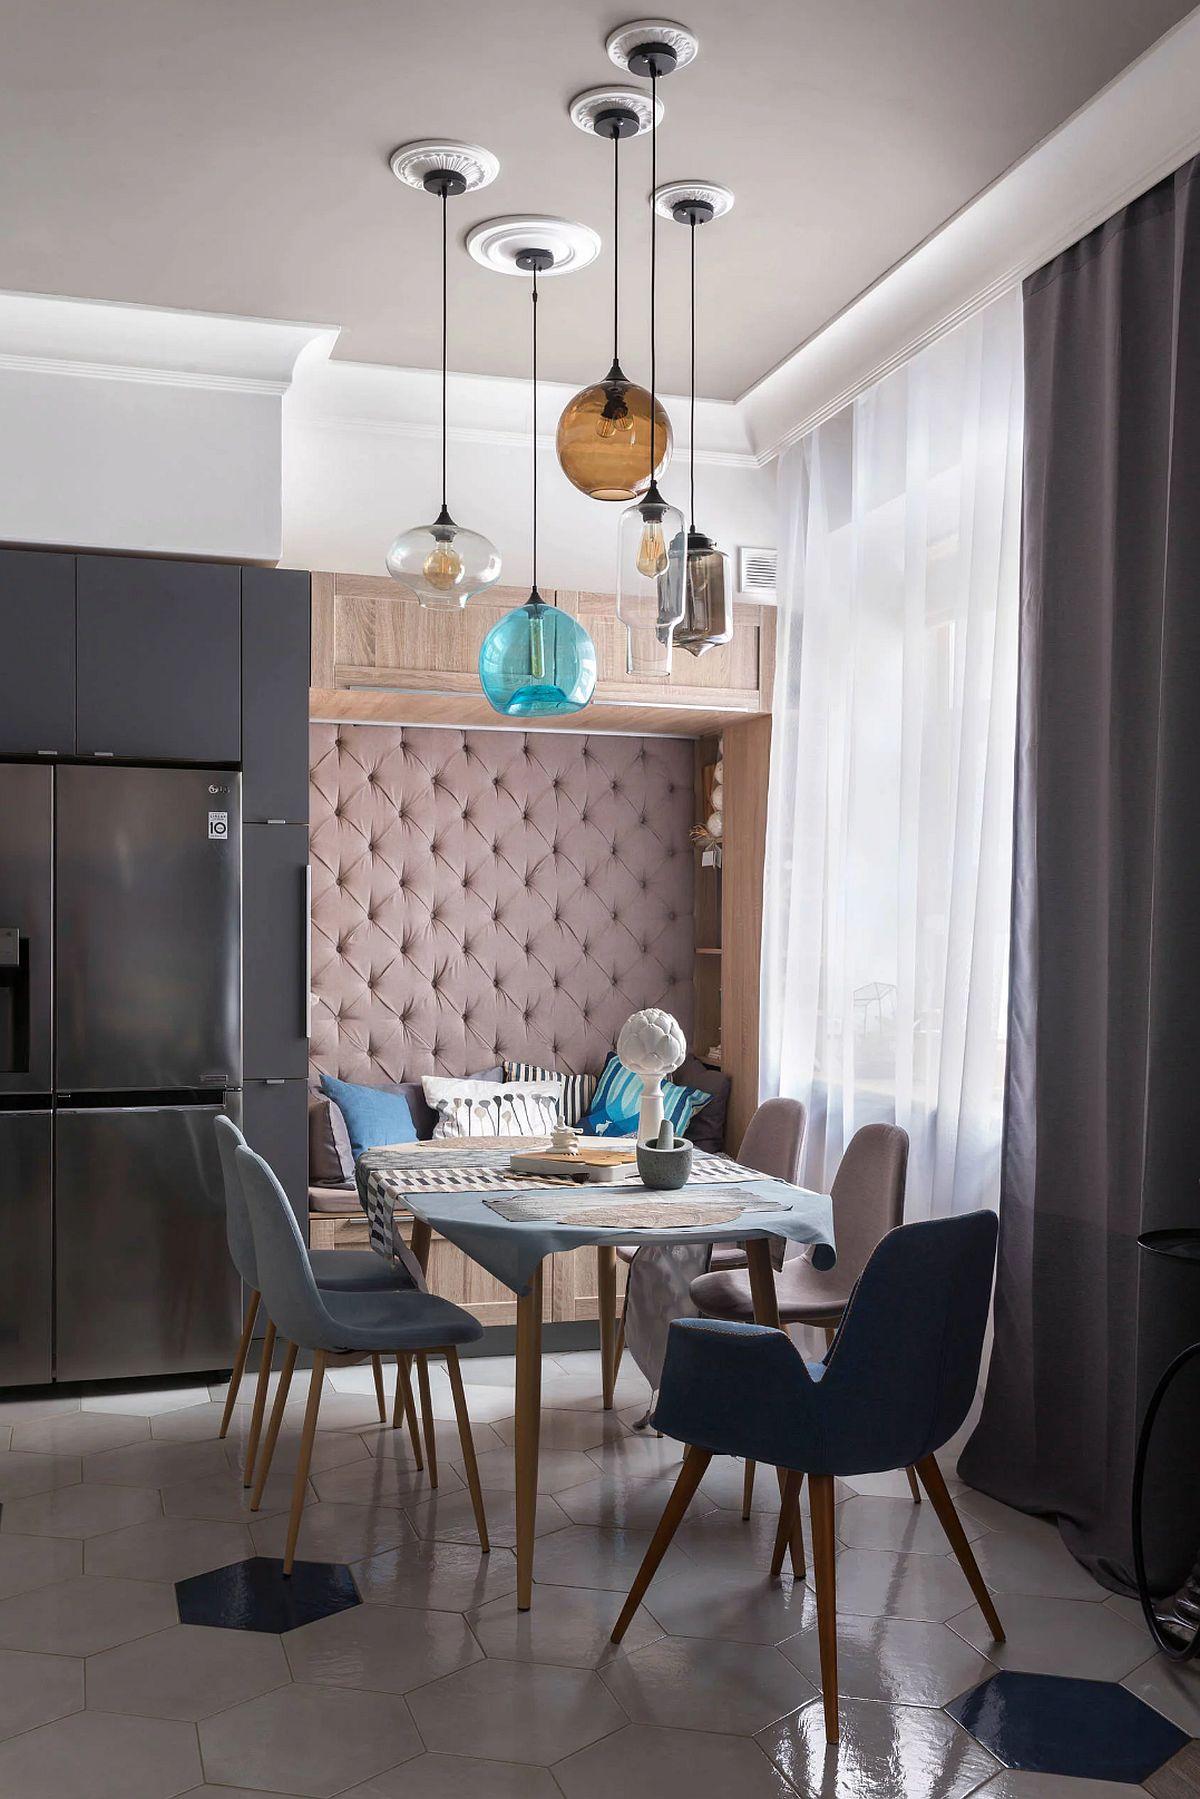 adelaparvu.com despre amenajare apartament 83 mp, designer Olga Smolenskaya, Foto Ulyana Grishina (16)